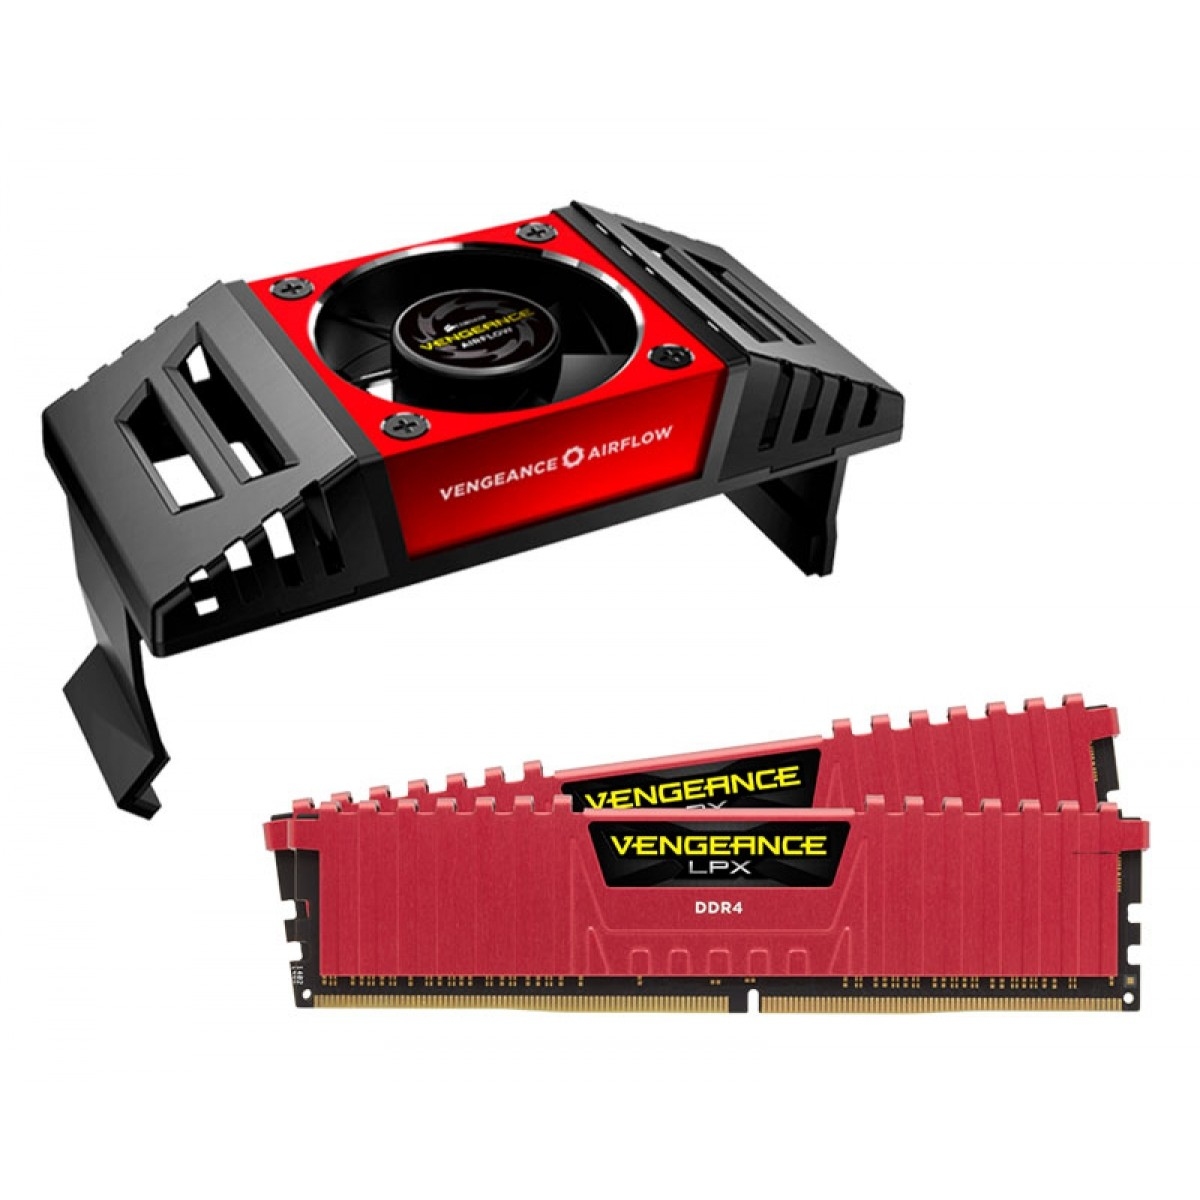 CORSAIR Vengeance LPX 16GB DDR-4 3733MHz (8GBX2) Kit Memory